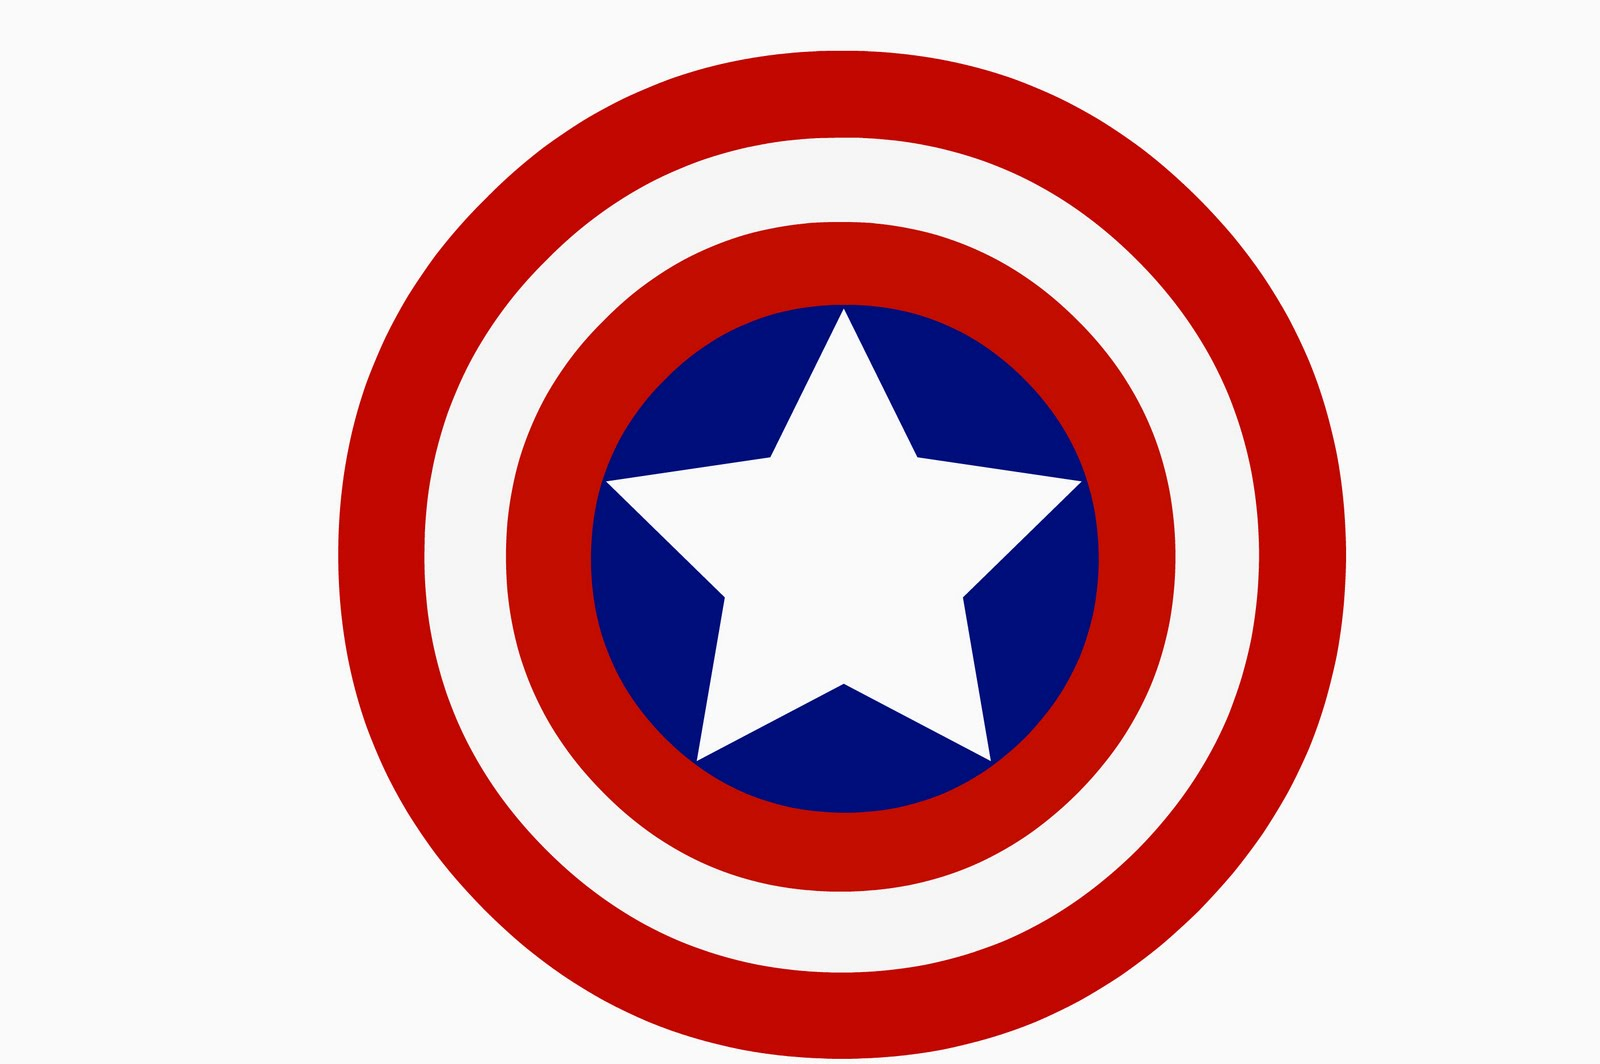 Related Logos For Captain America Logo